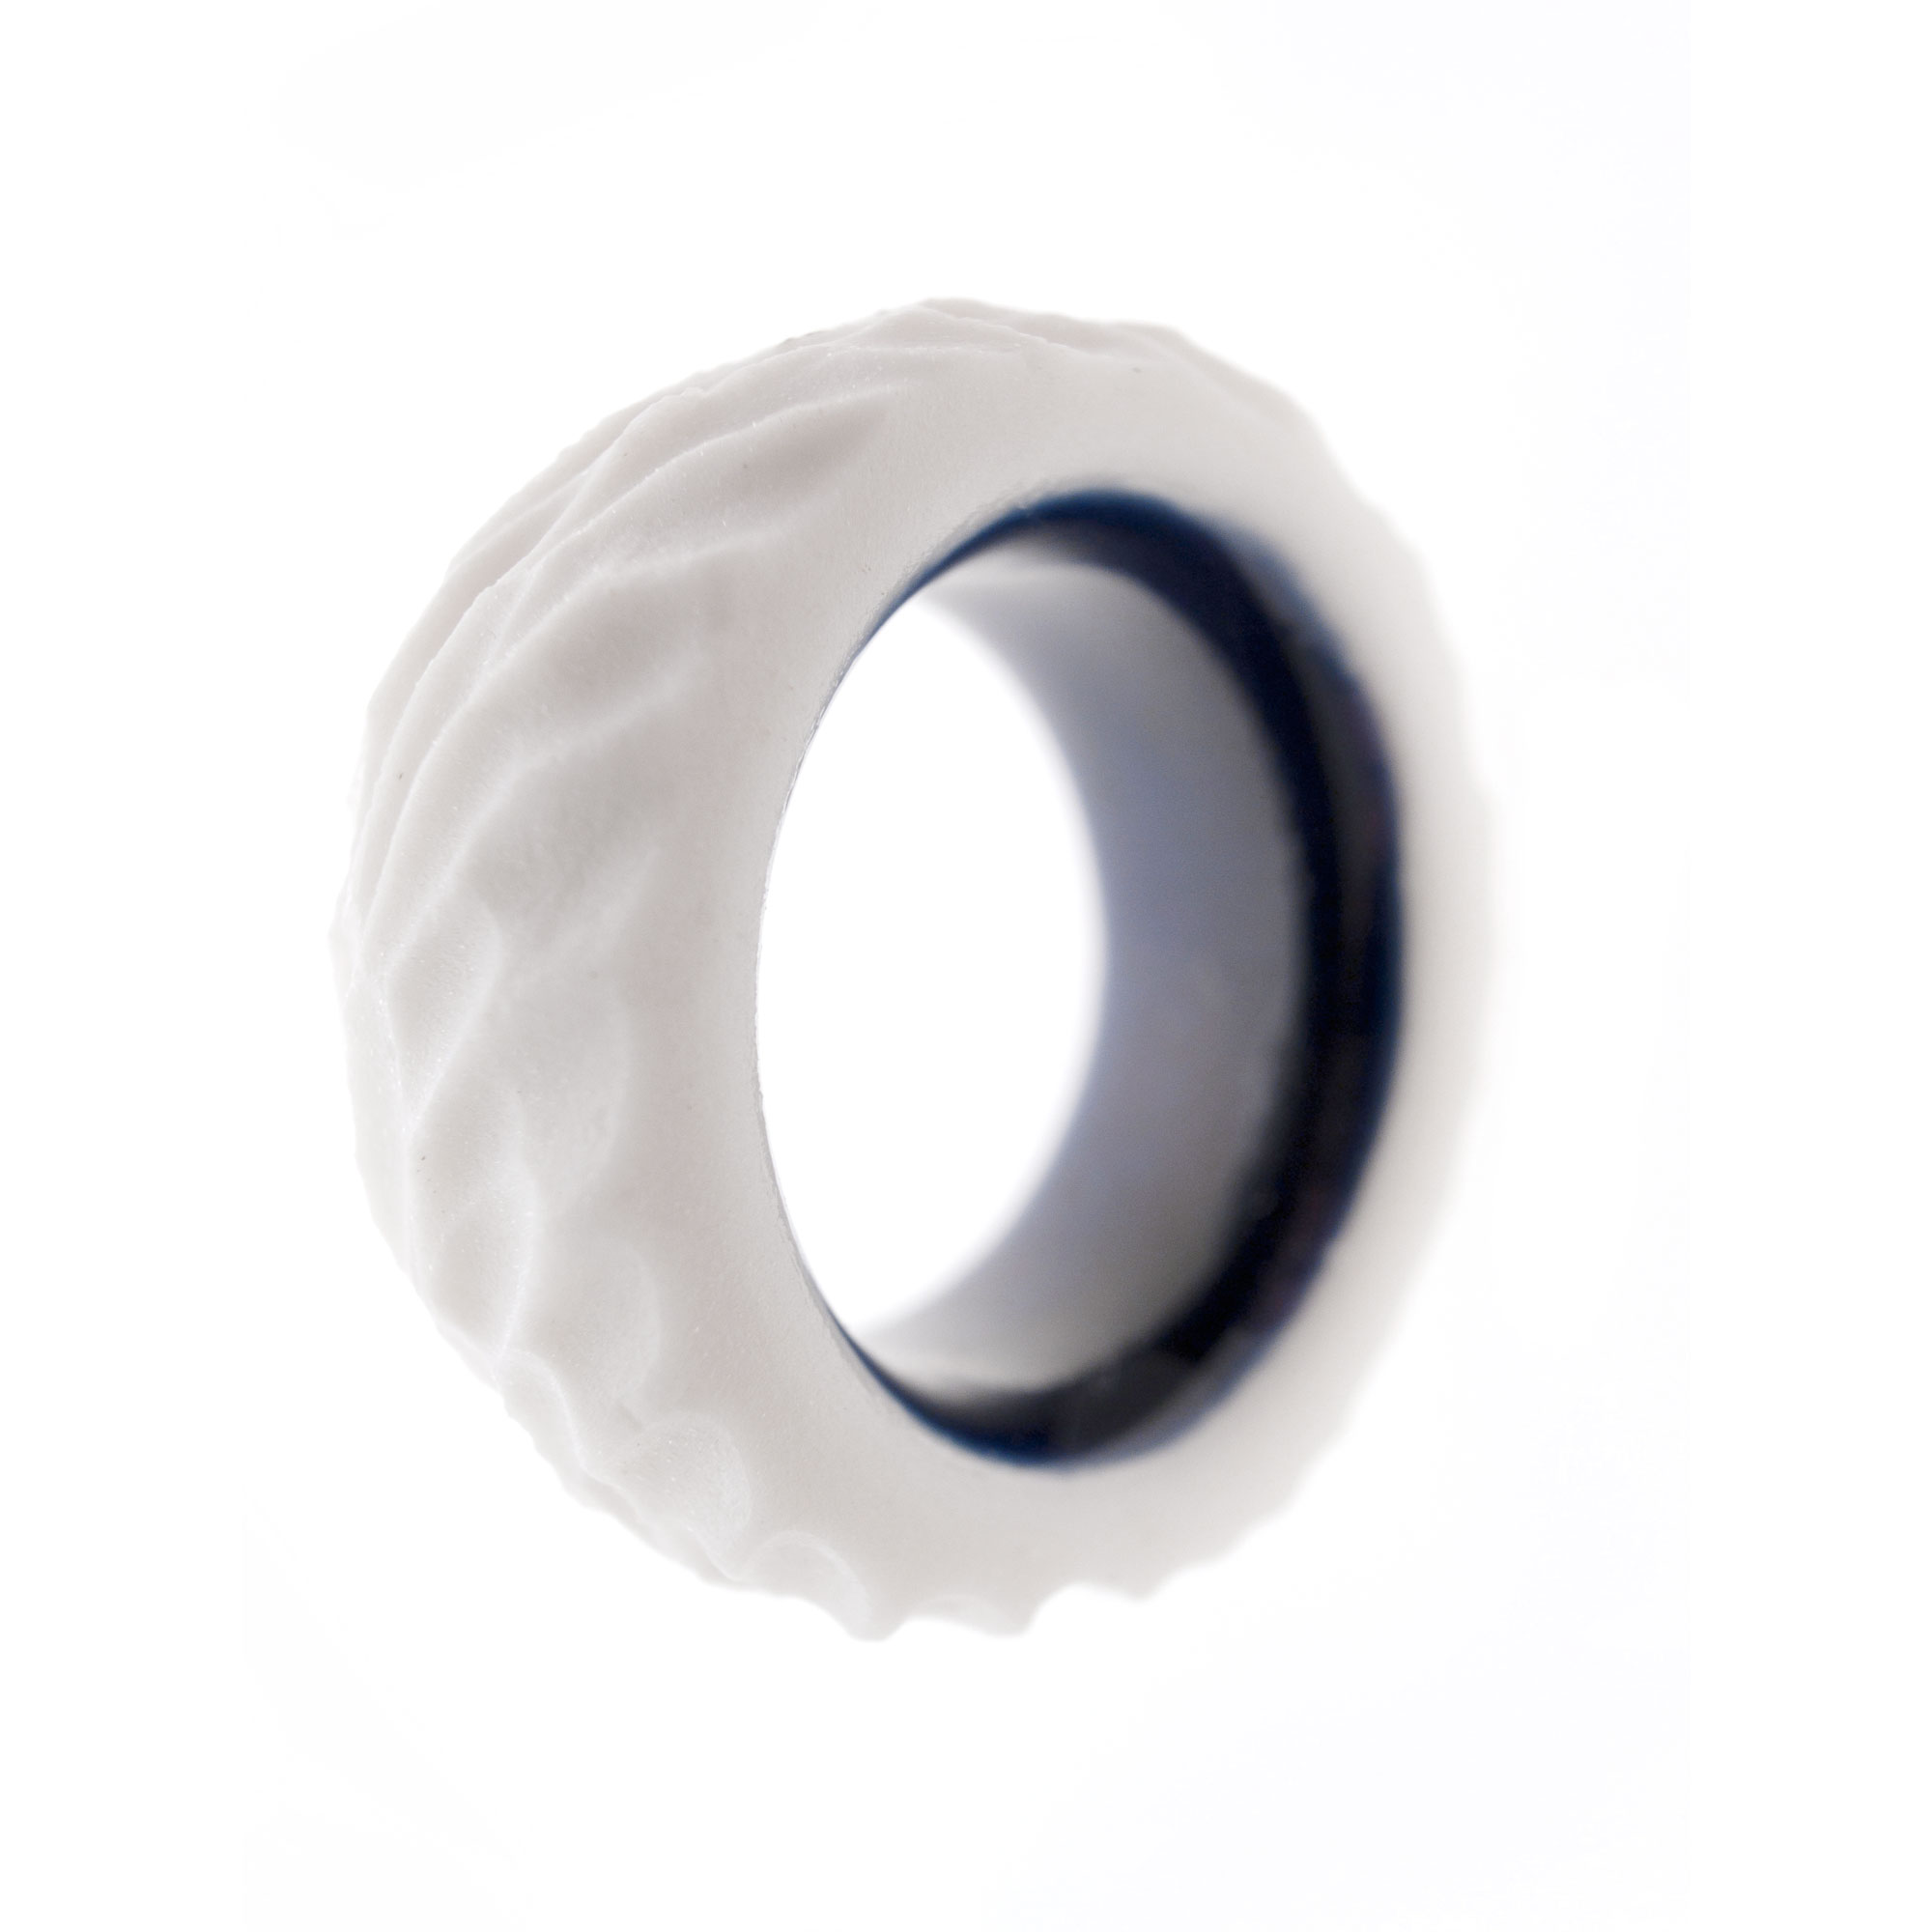 Anna-Kiryakova-Blue-Rough-Ring-Porzellan-Schmuck